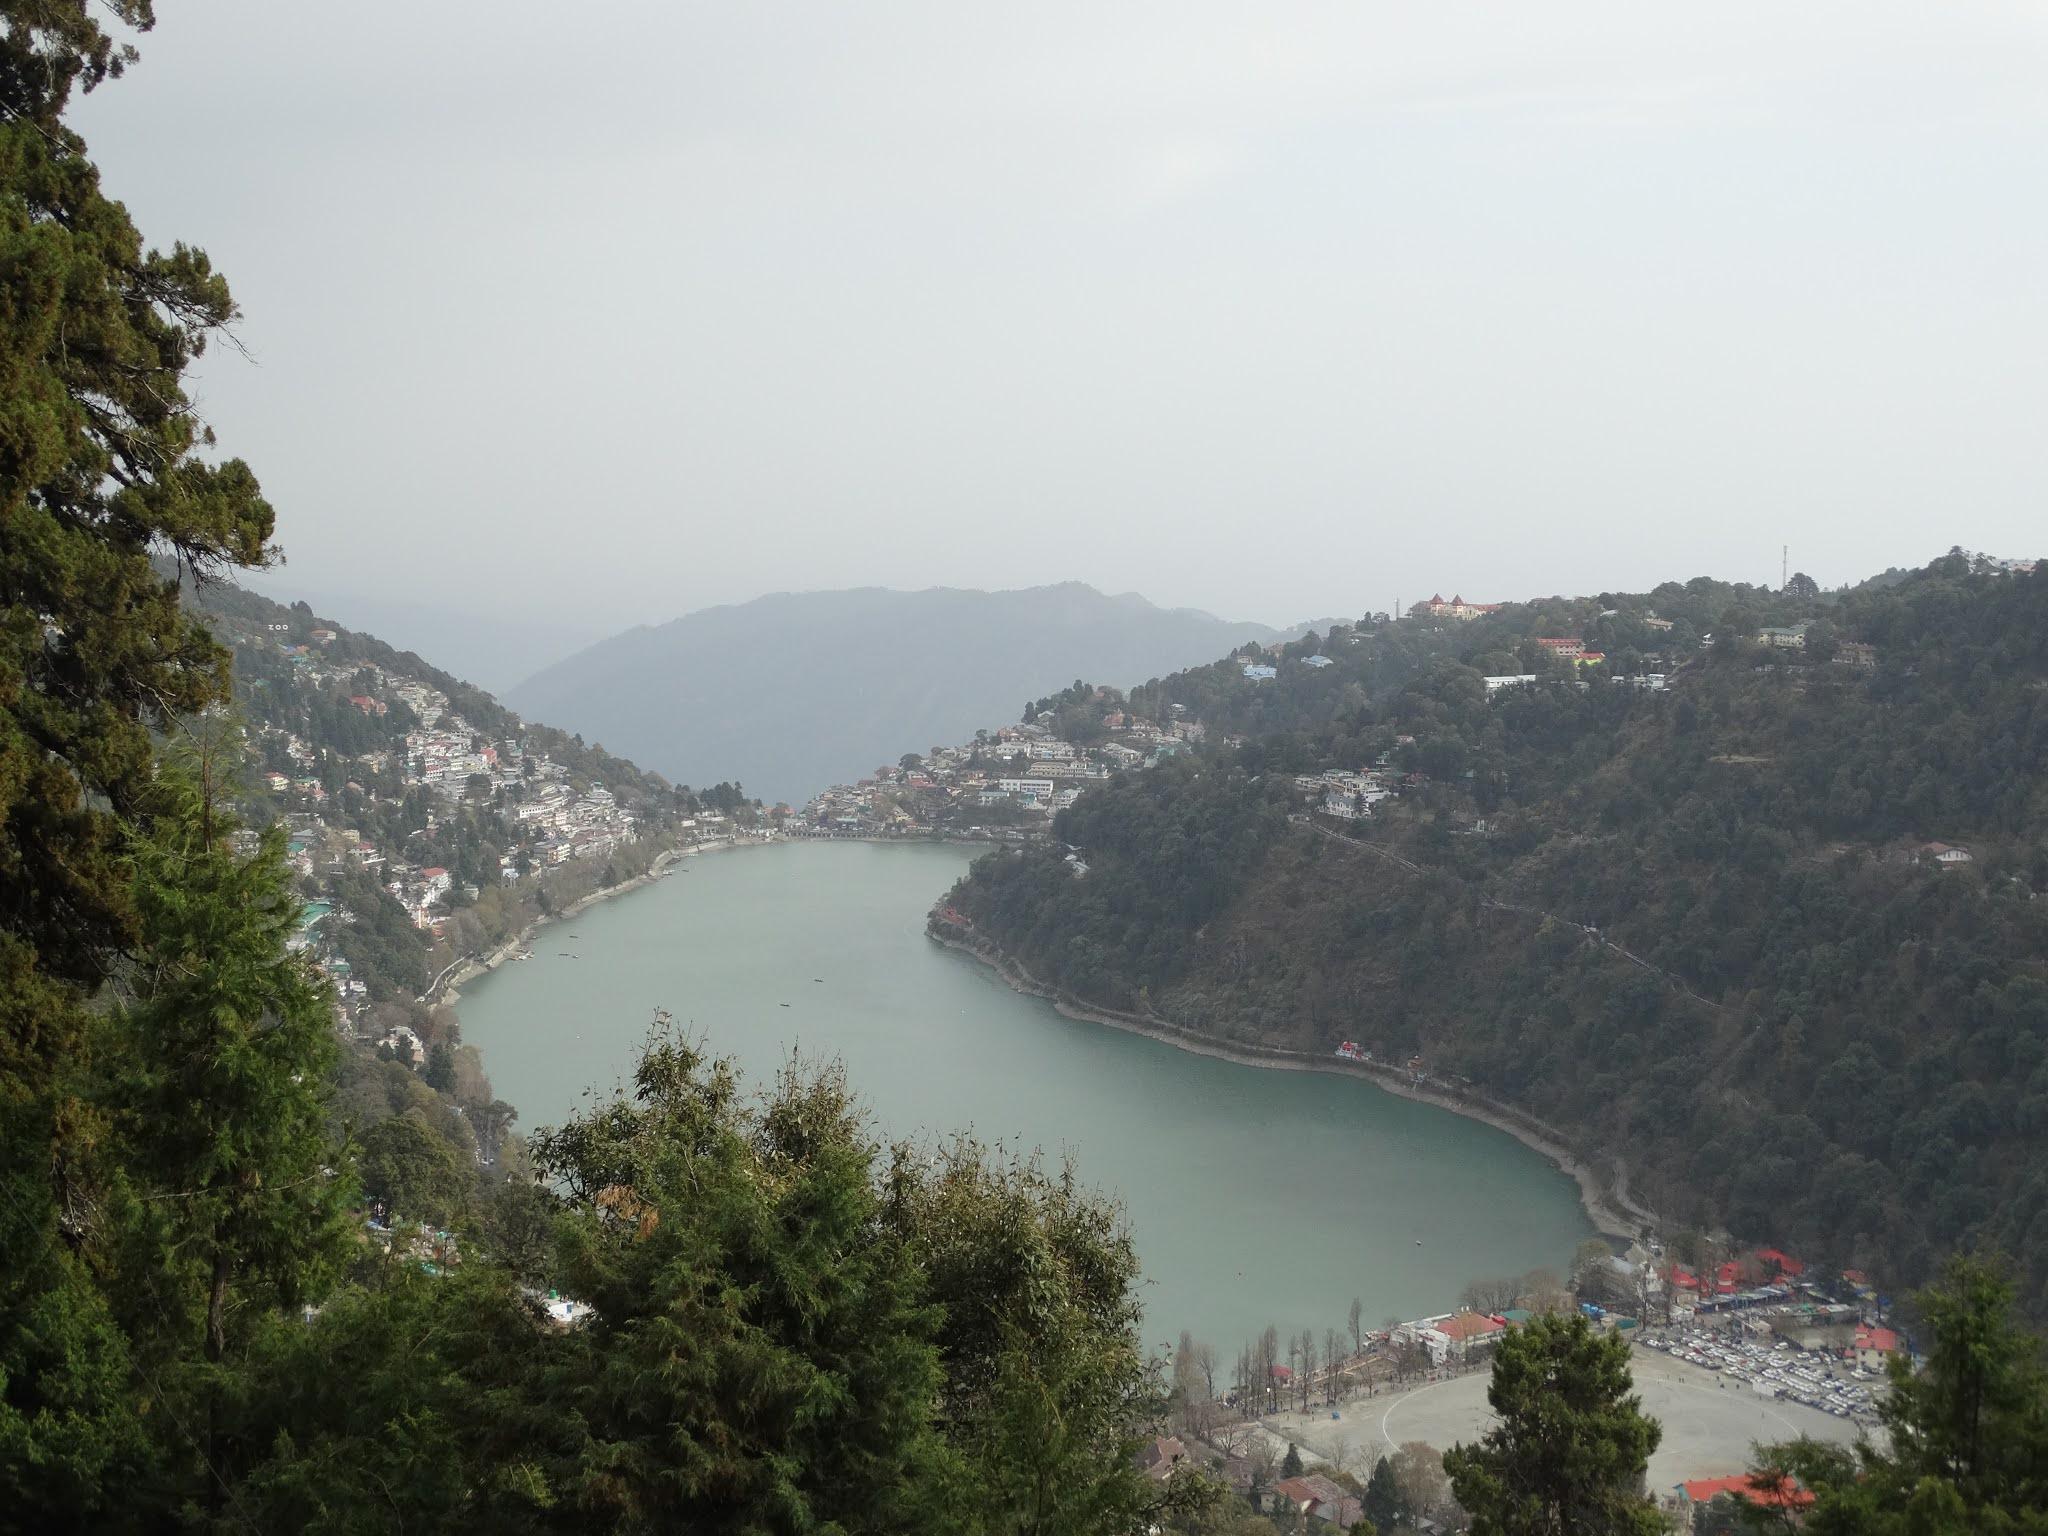 nainital - lake city of uttarakhand